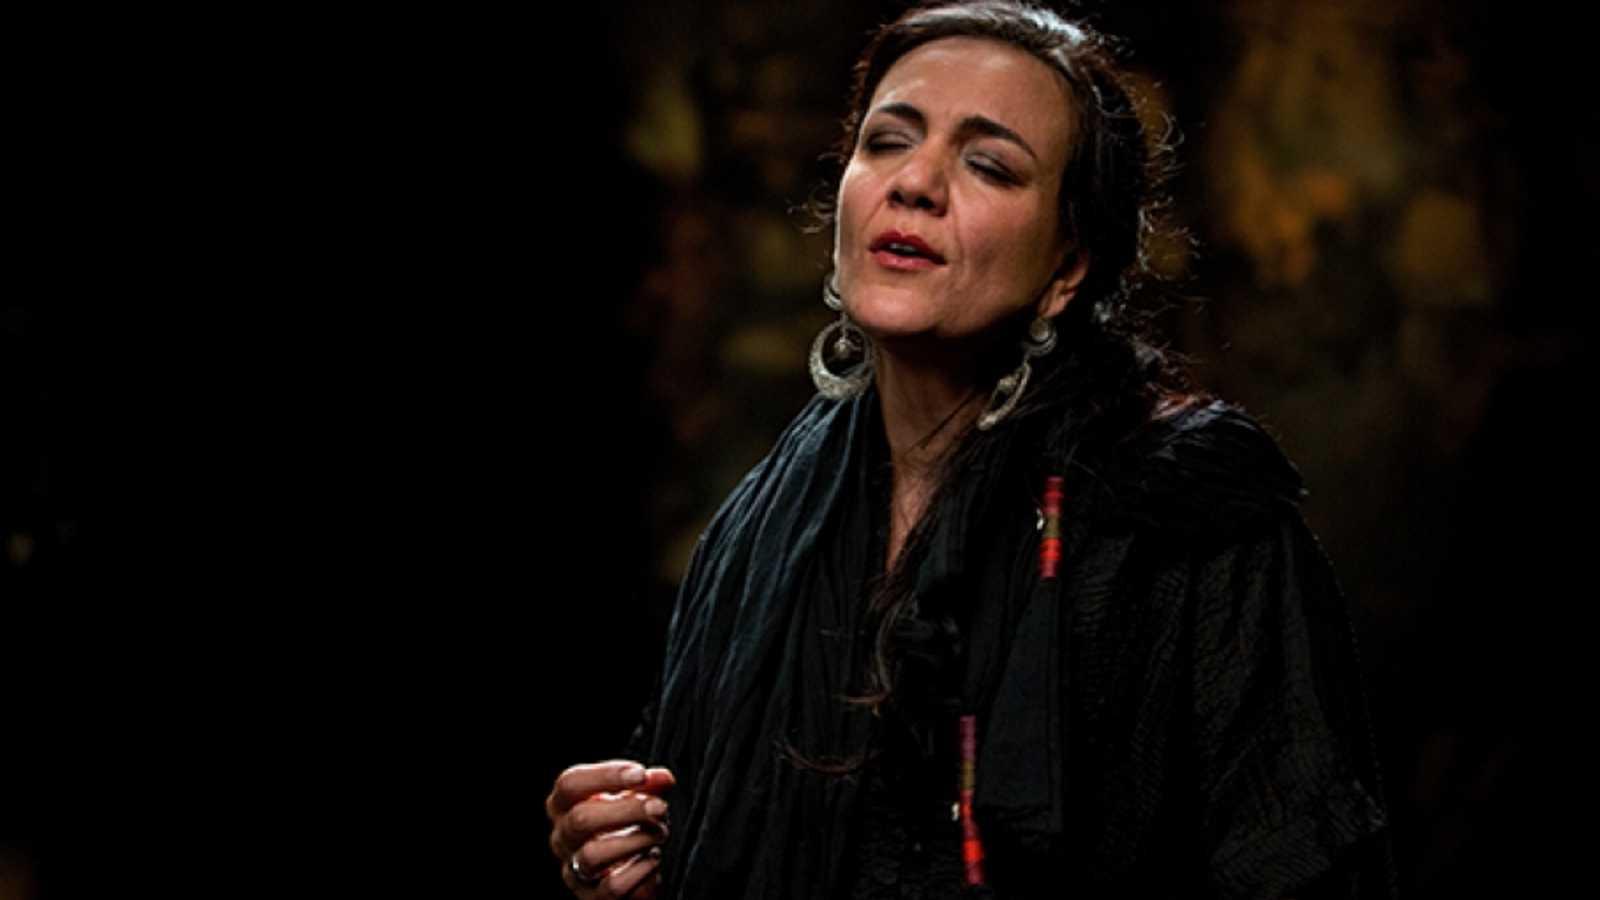 Rumbo al este - Marjan Vahdat: Serena esperanza - 05/05/21 - escuchar ahora